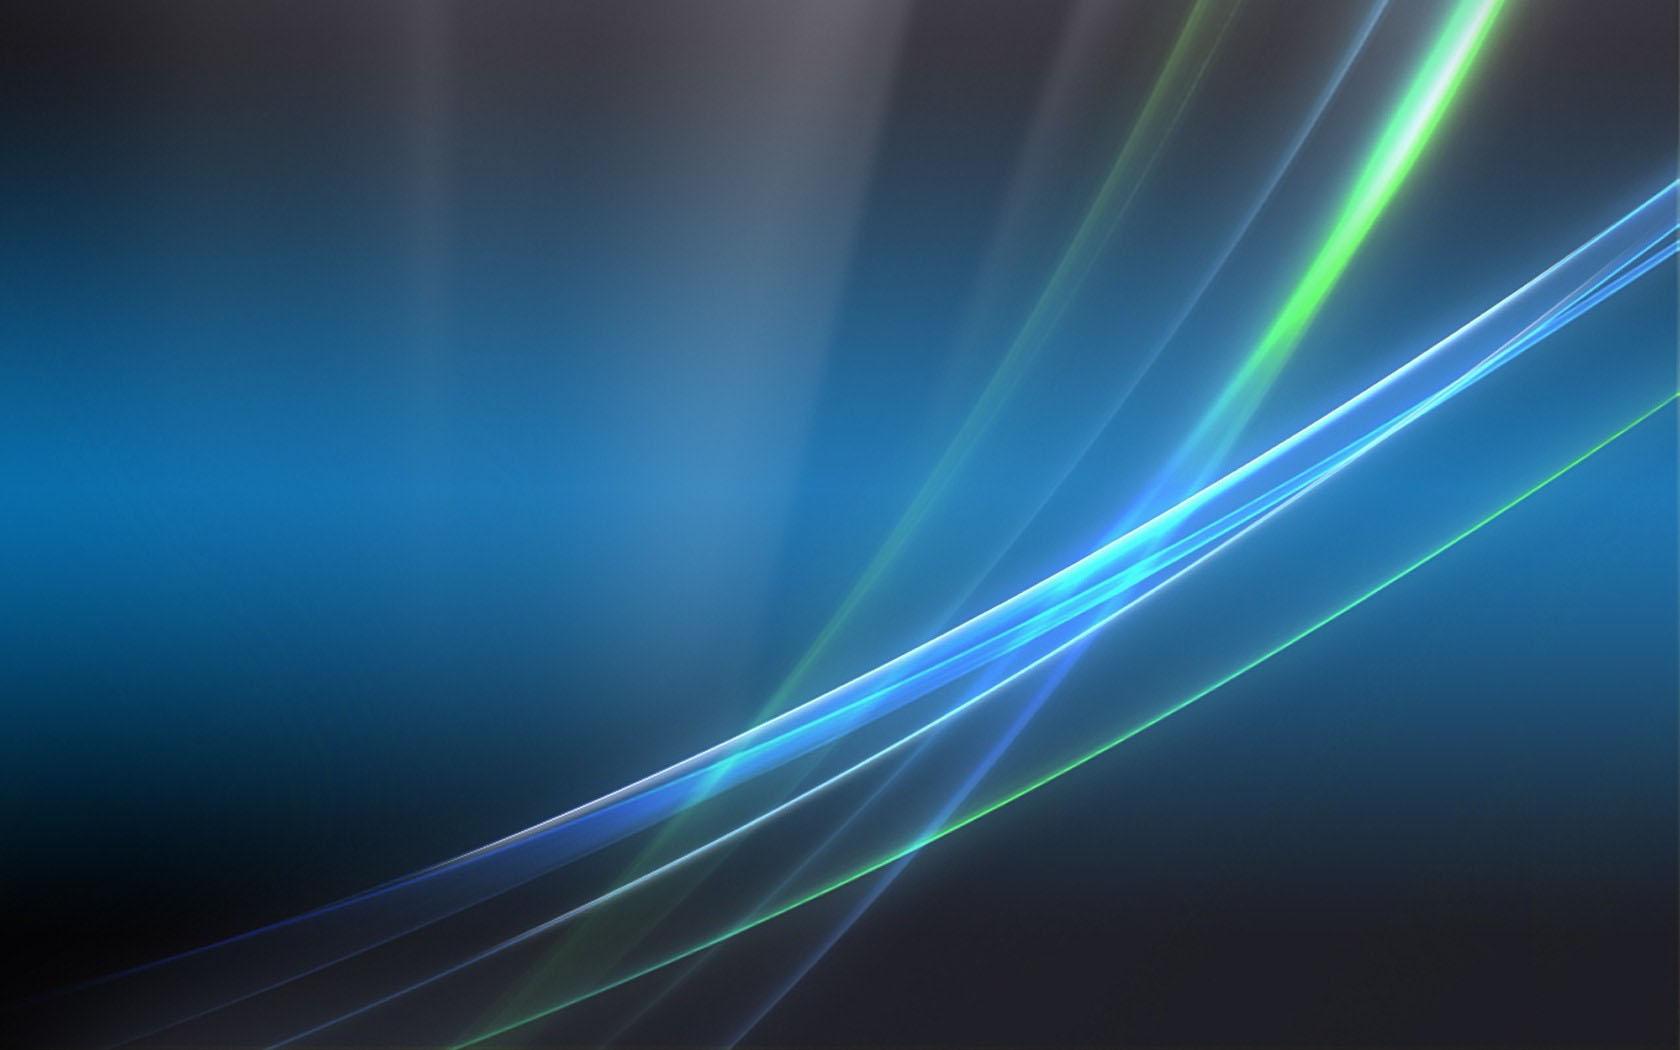 Hd Abstract Desktop Wallpaper: Abstract Background Wallpaper